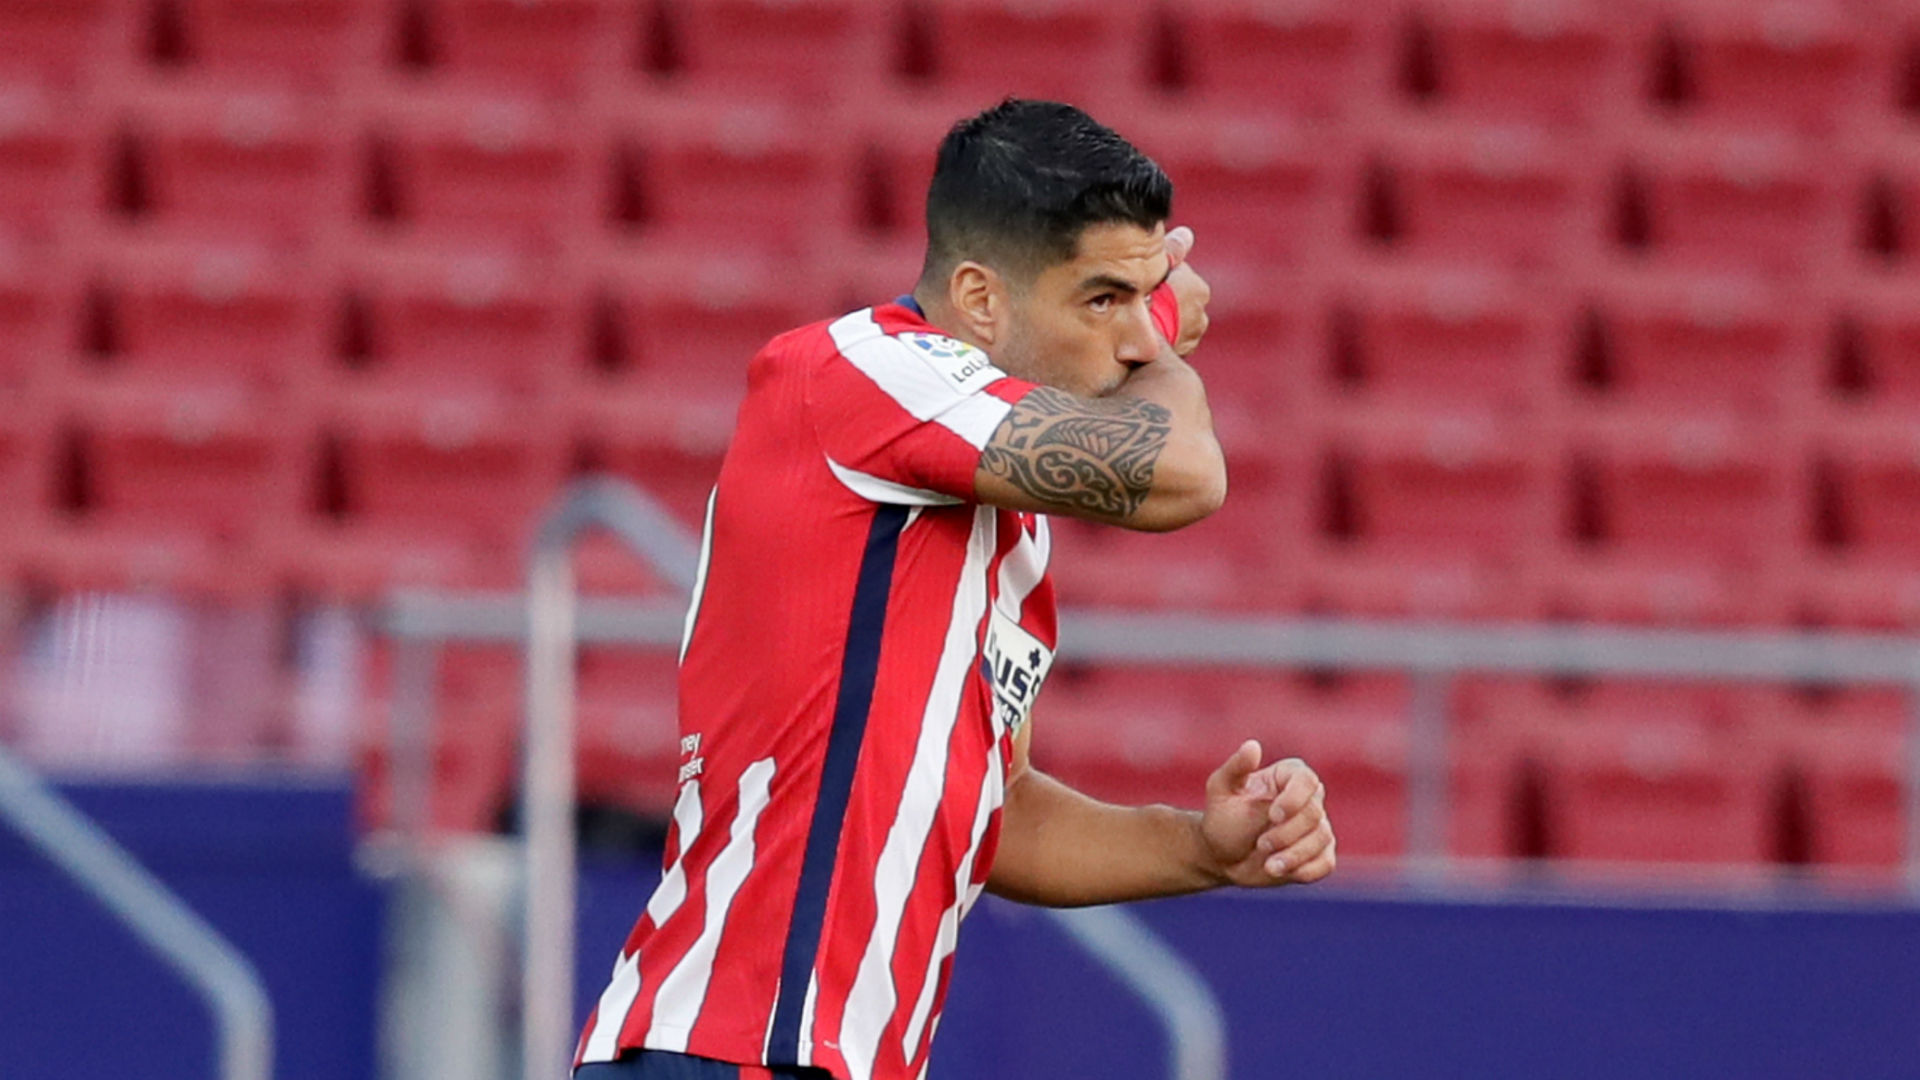 Atletico Madrid 6-1 Granada: Suarez at the double on debut as Rojiblancos run riot